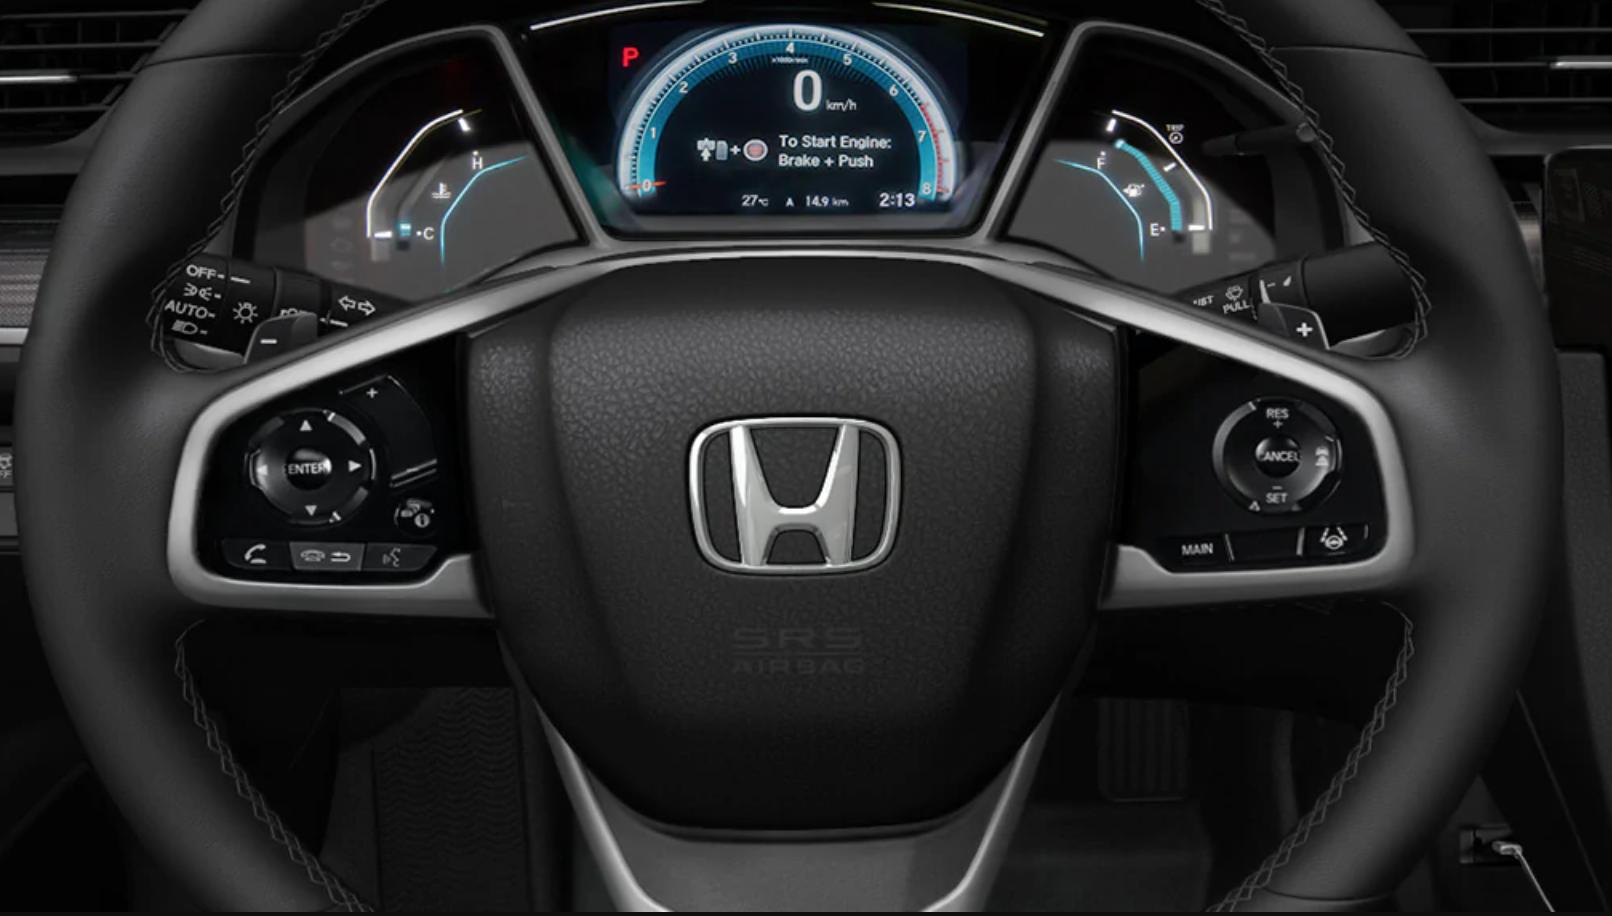 Honda Civic oil life indicator